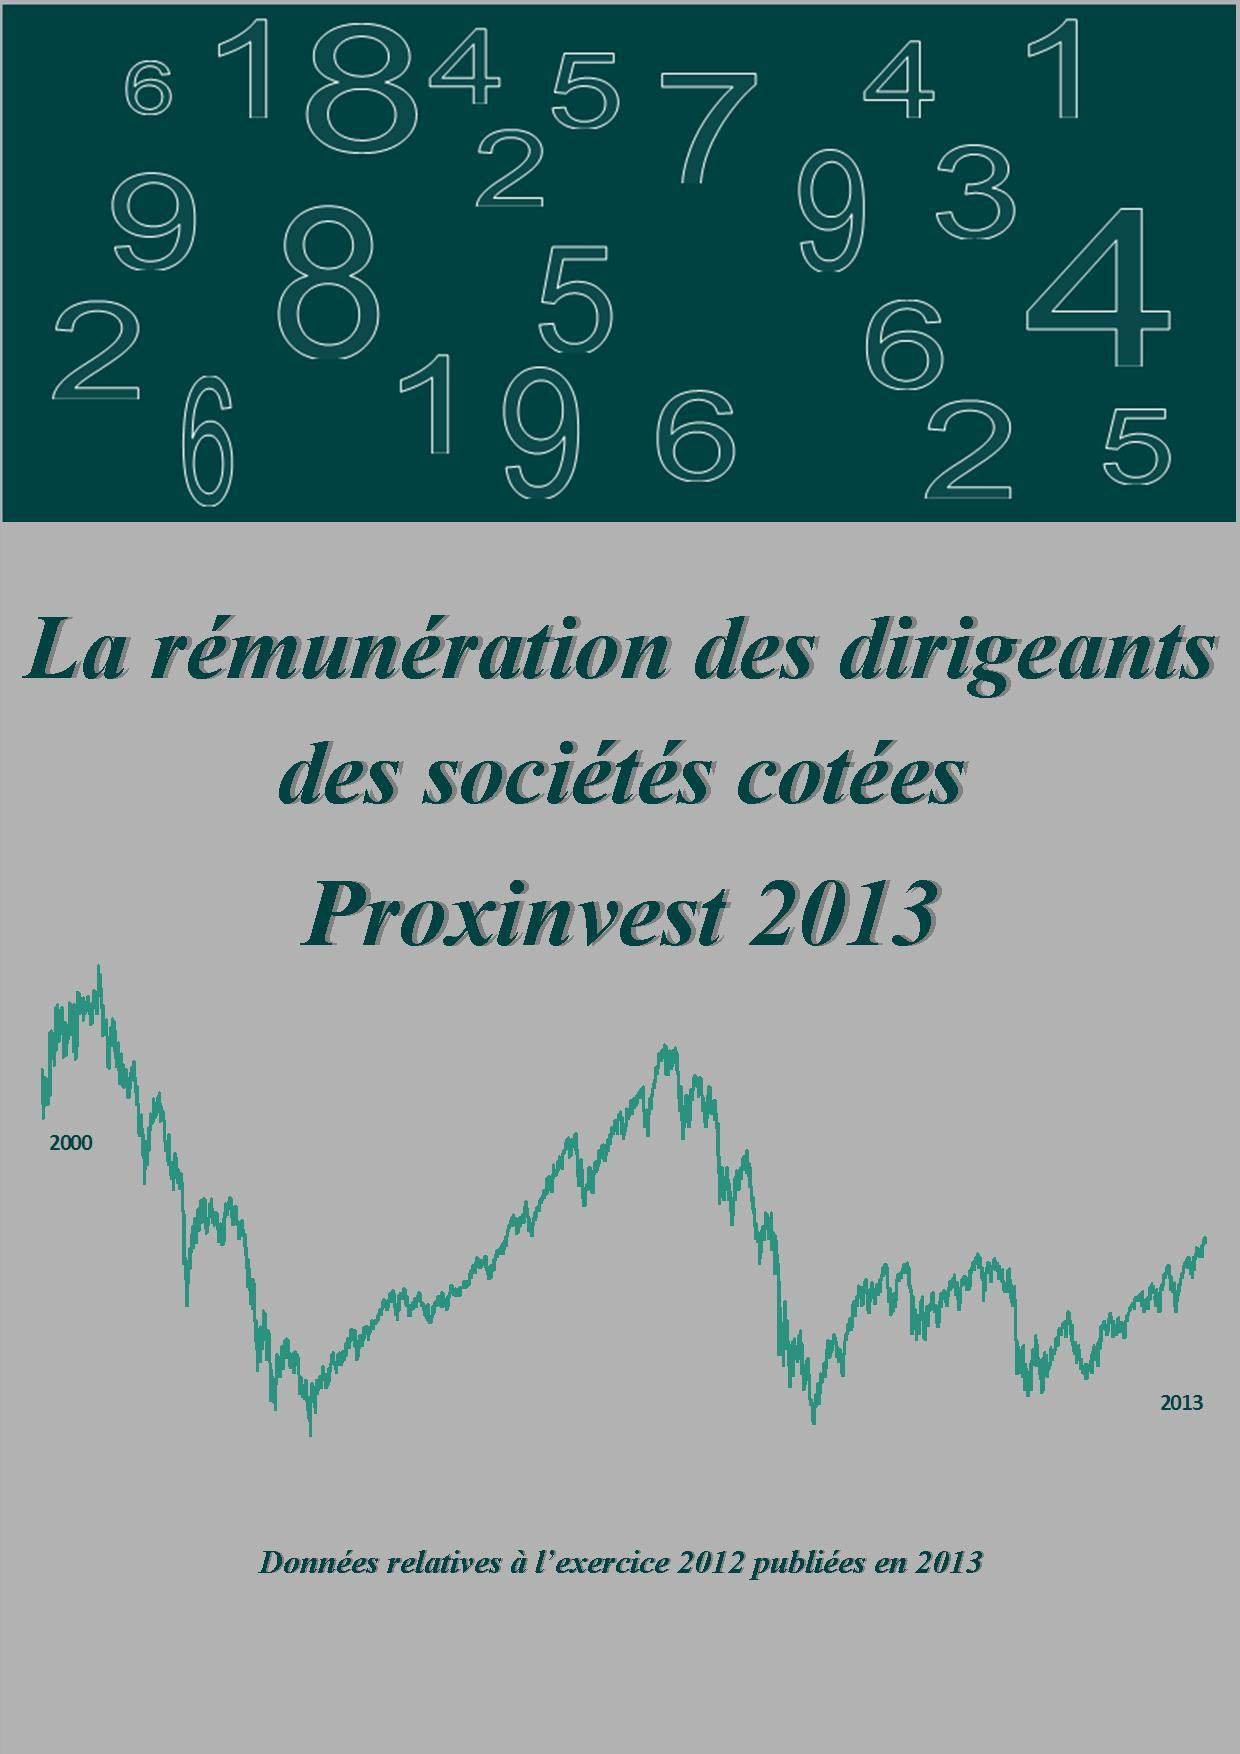 LA REMUNERATION DES DIRIGEANTS DES SOCIETES COTEES 2013